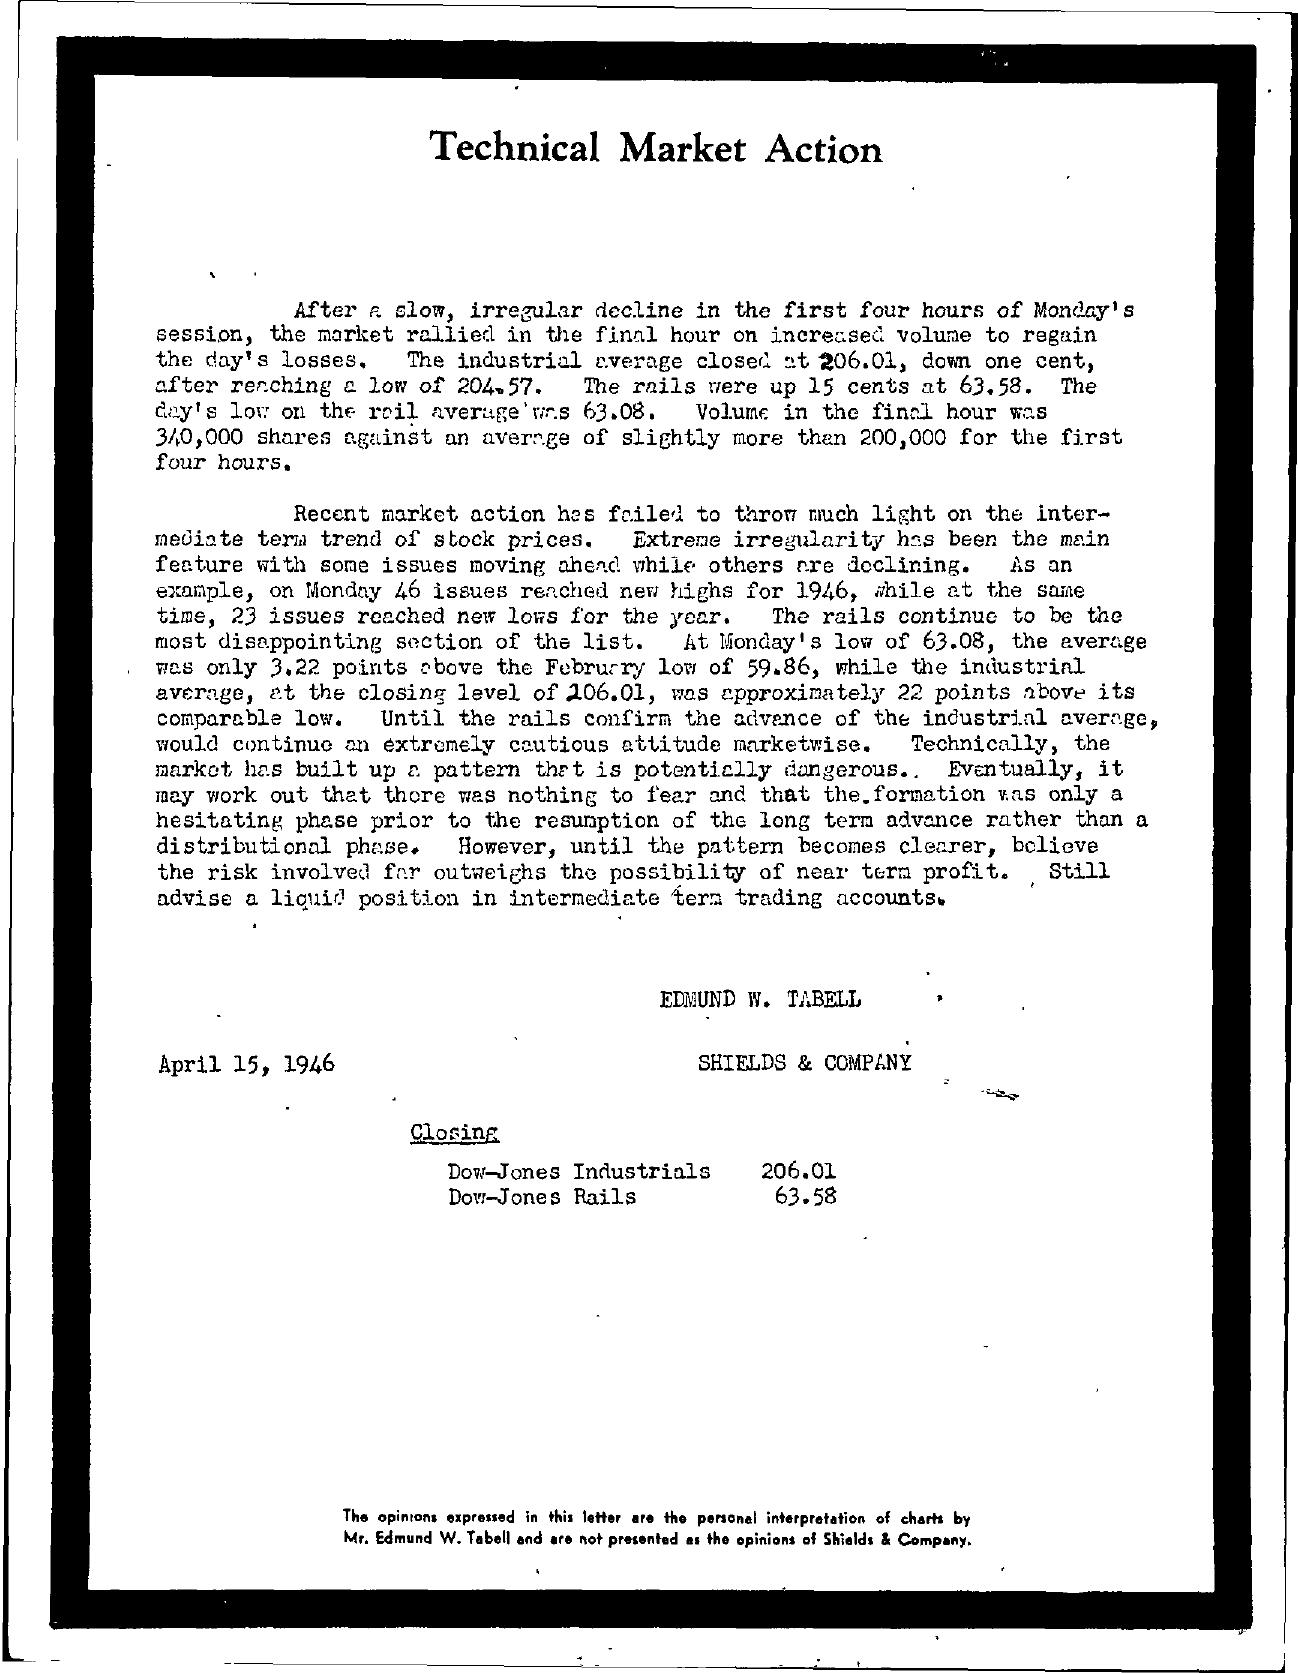 Tabell's Market Letter - April 15, 1946